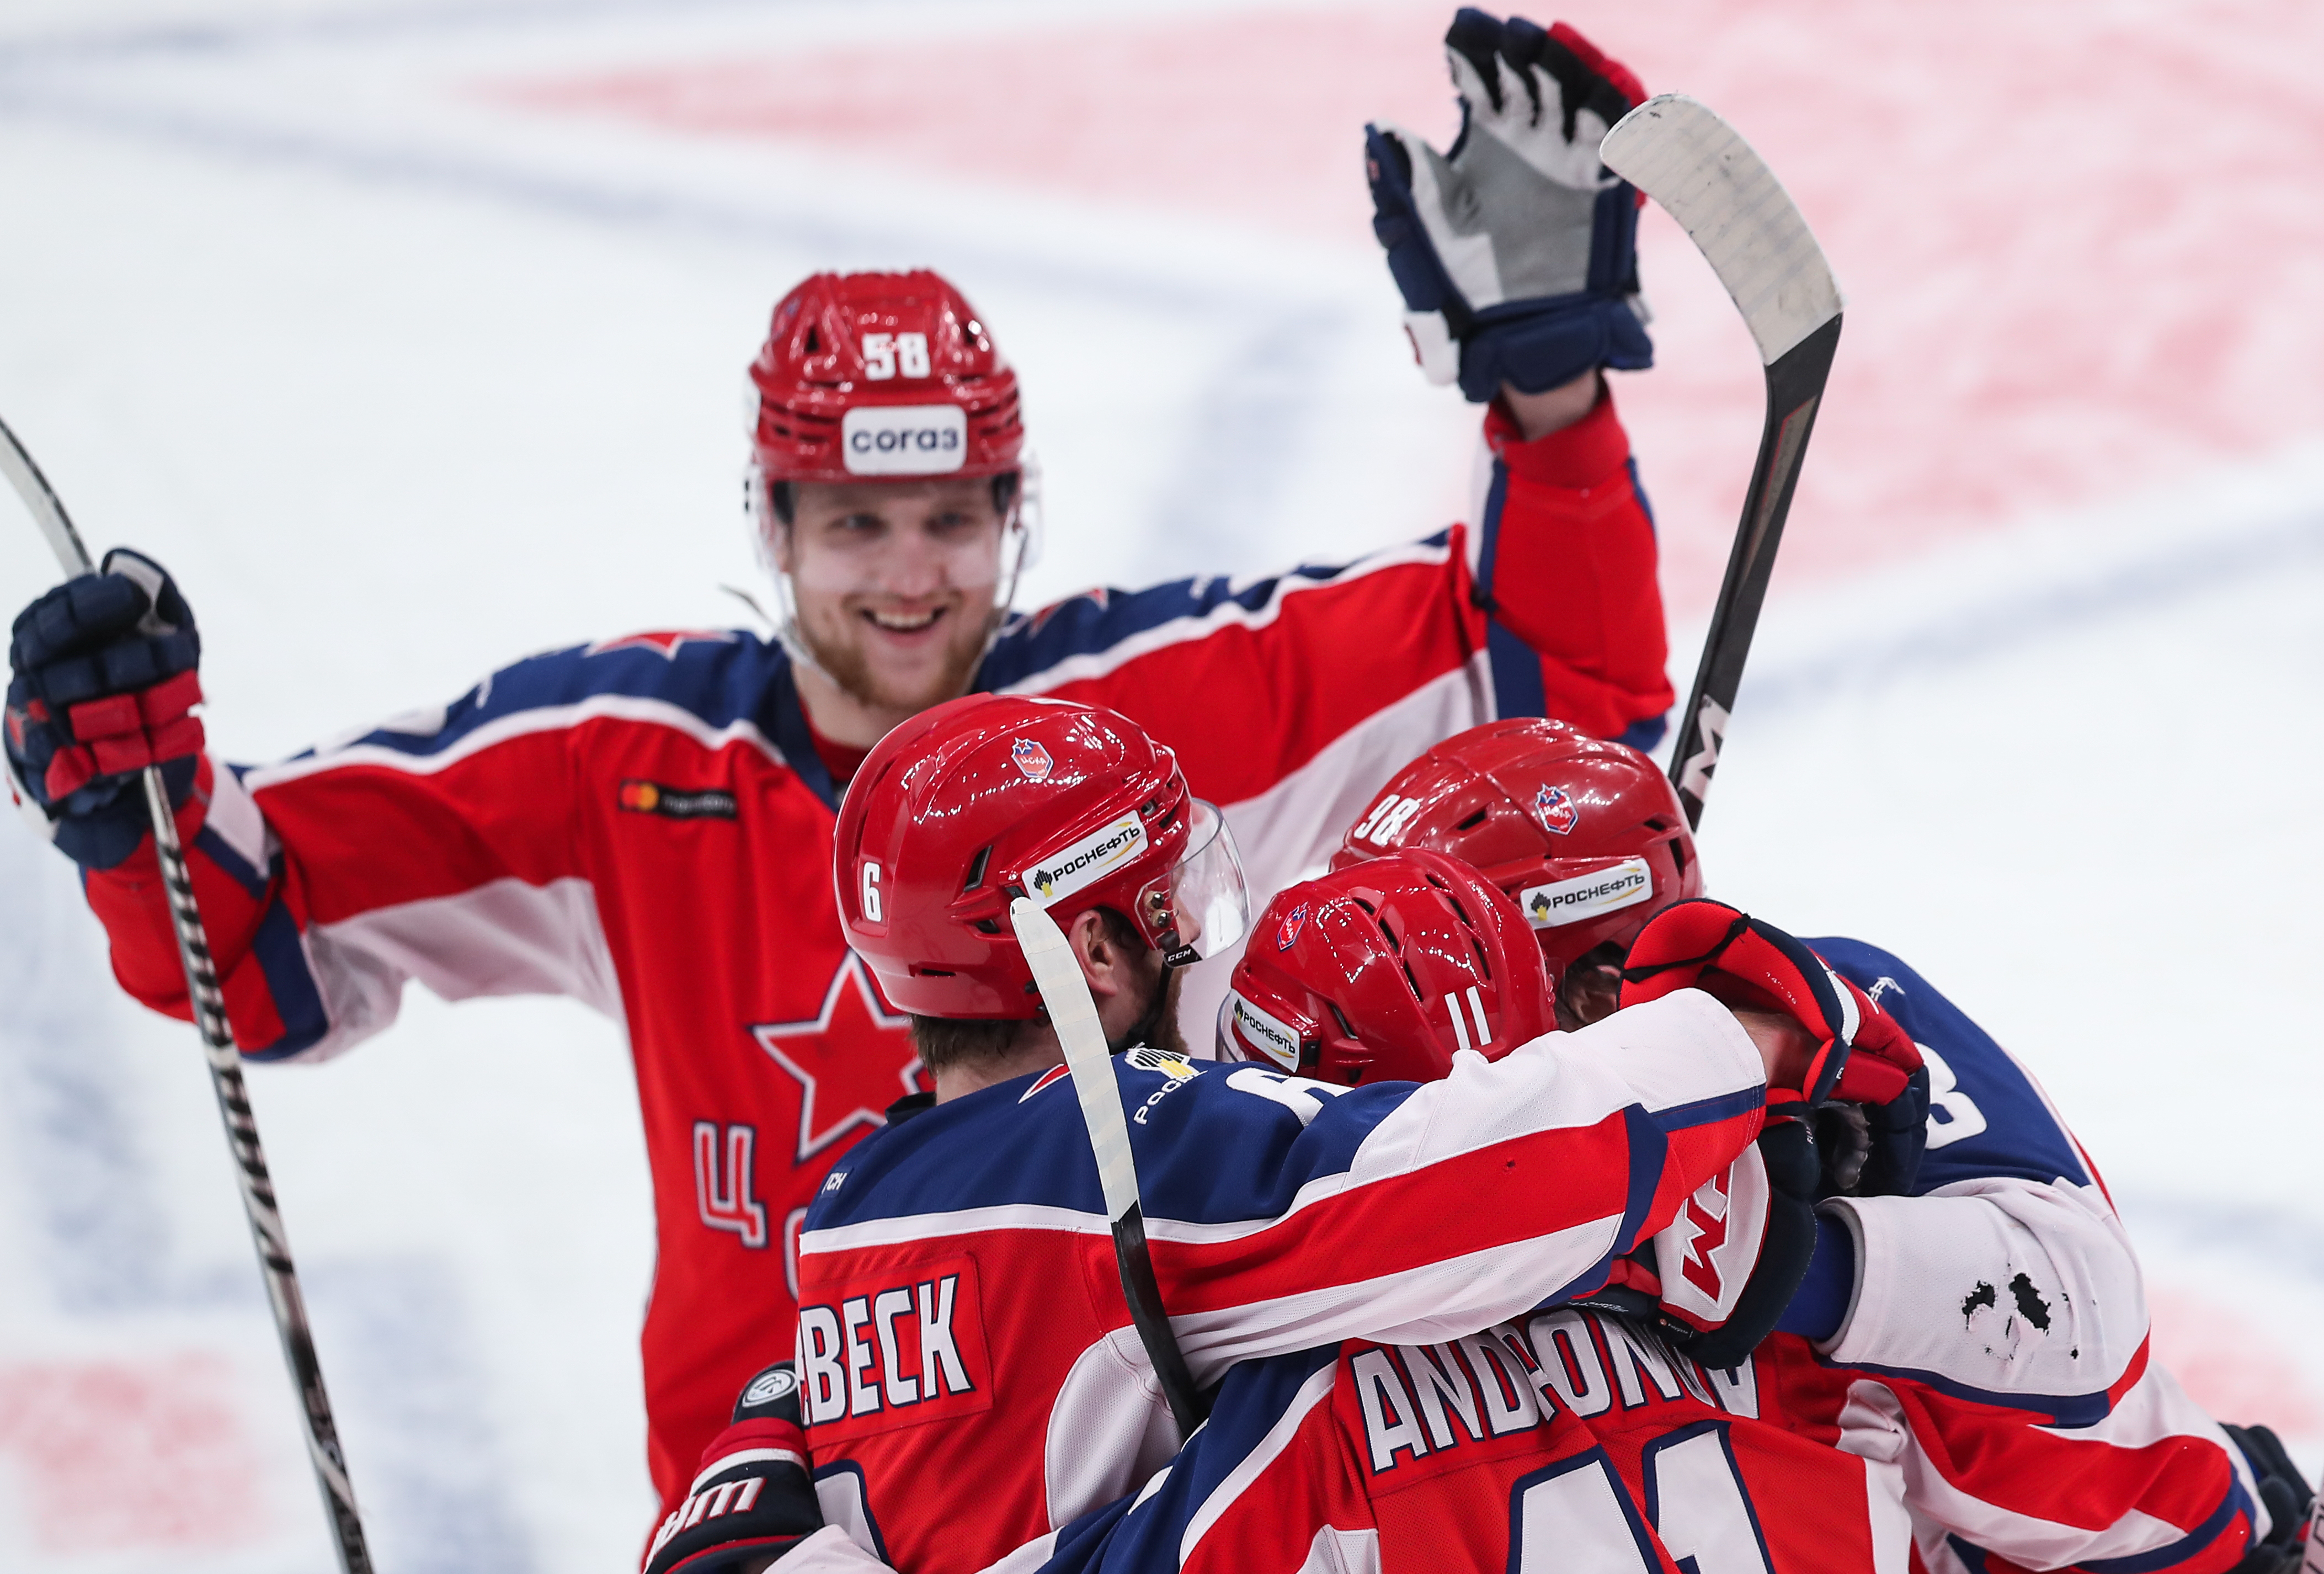 2020/2021 Kontinental Hockey League: CSKA Moscow vs Spartak Moscow